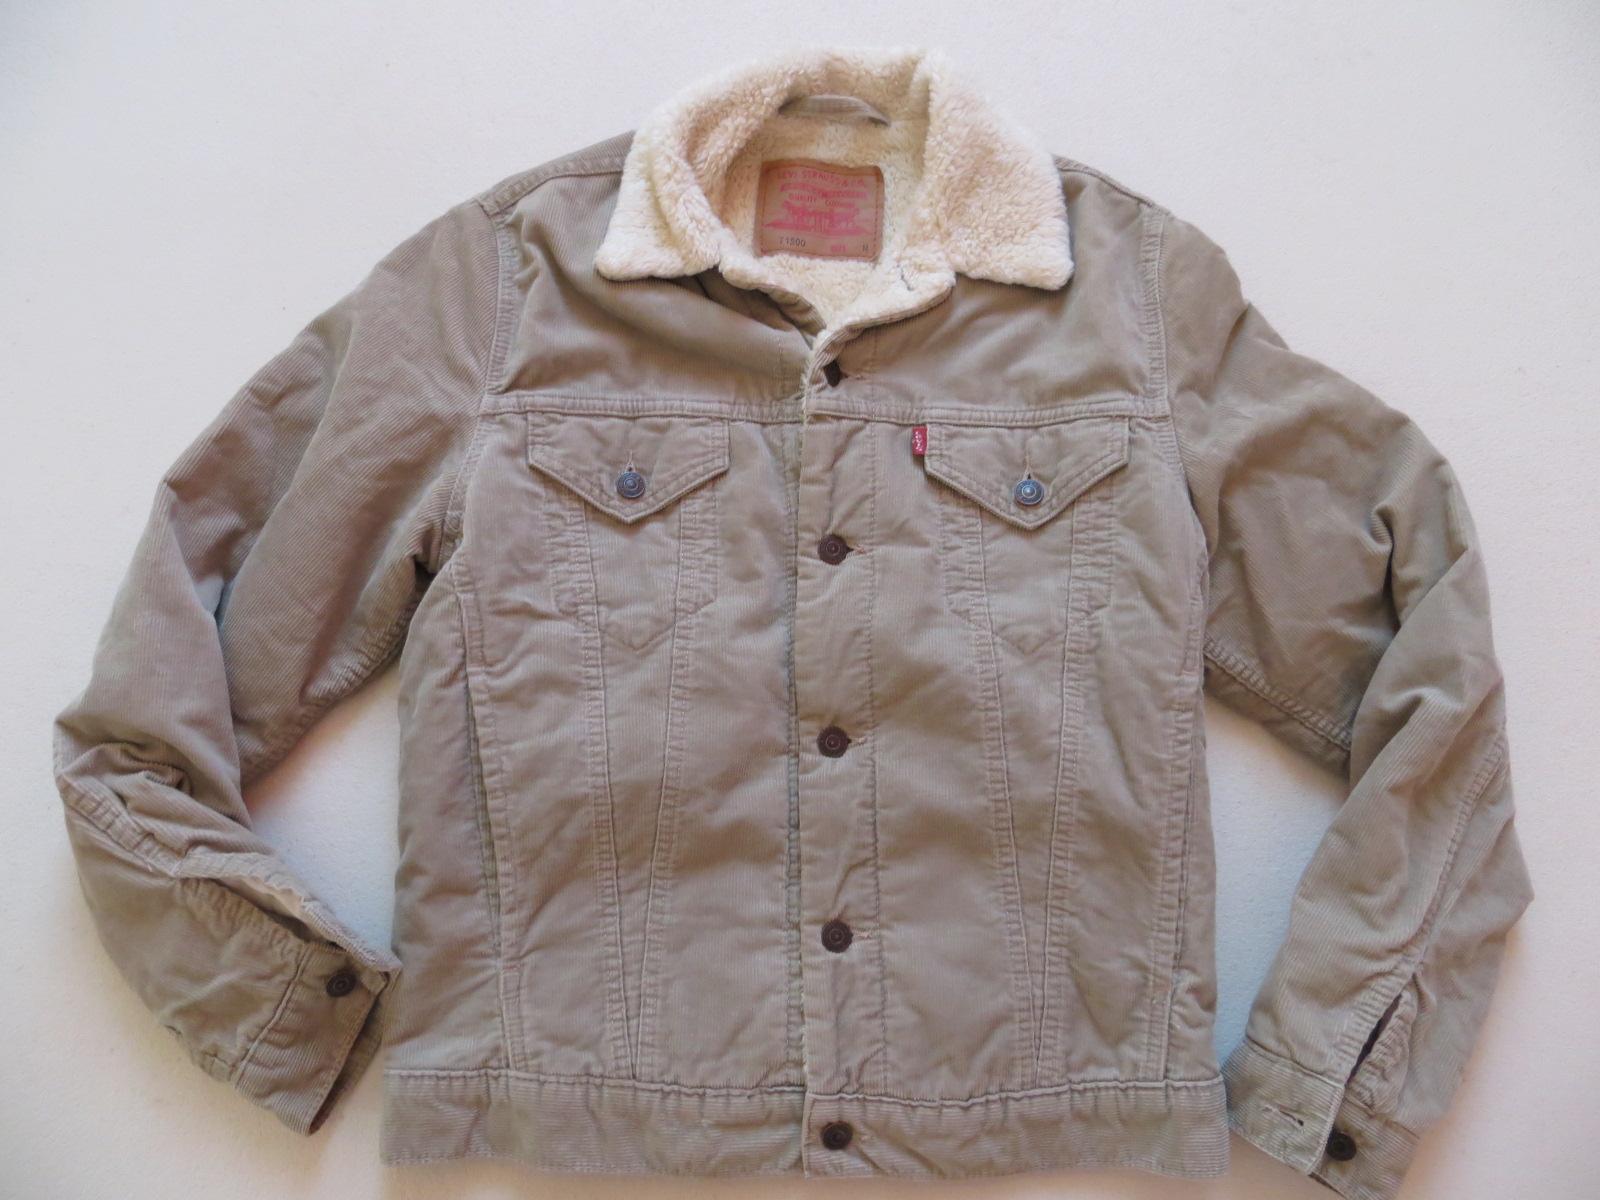 levi 39 s jeans cord jacke mit teddy fell gr m beige. Black Bedroom Furniture Sets. Home Design Ideas